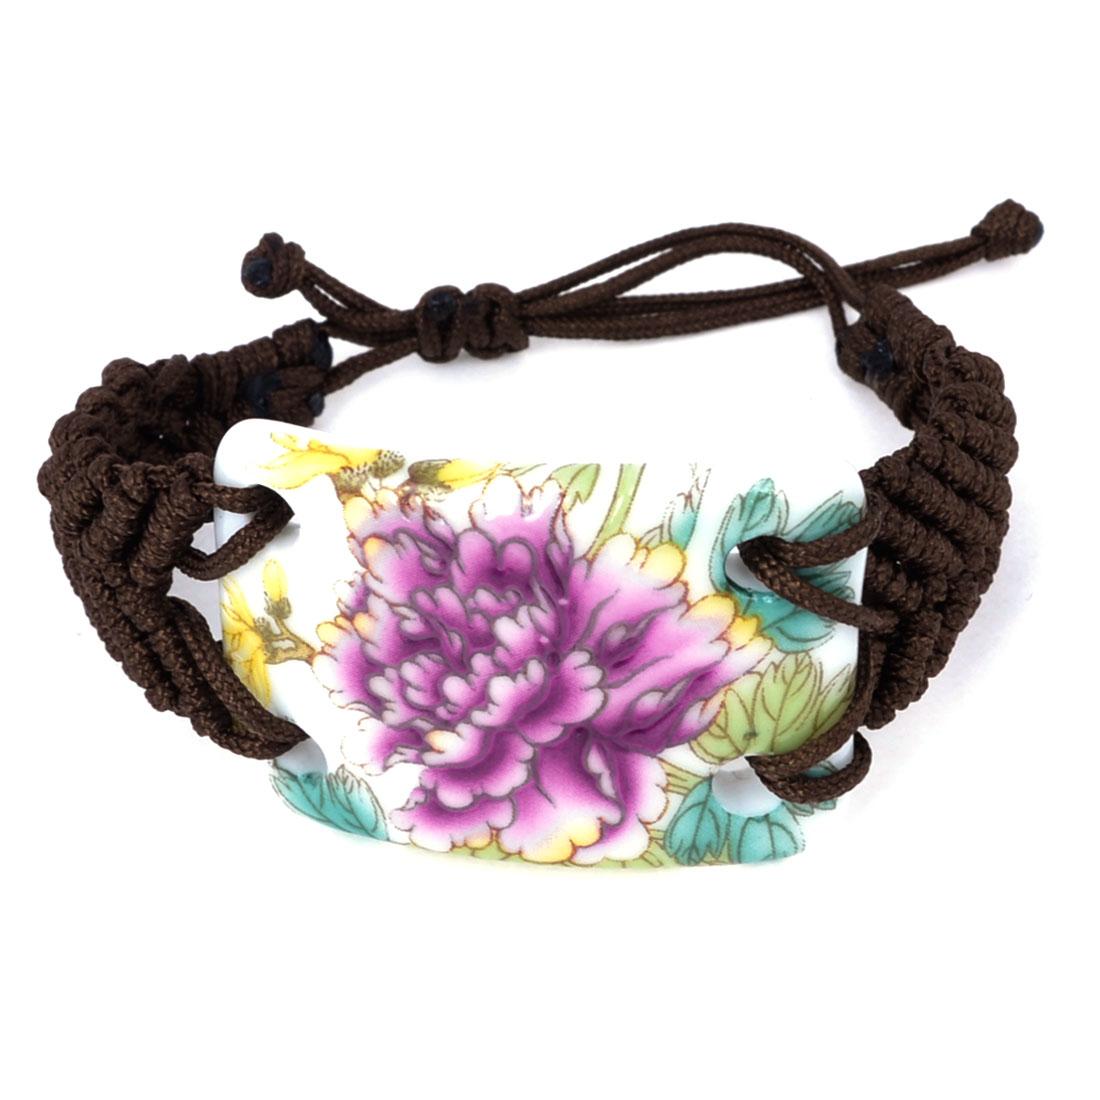 Lady Flower Printed Fibre Braid Wristband Wrist Ornament Ceramic Bracelet Brown